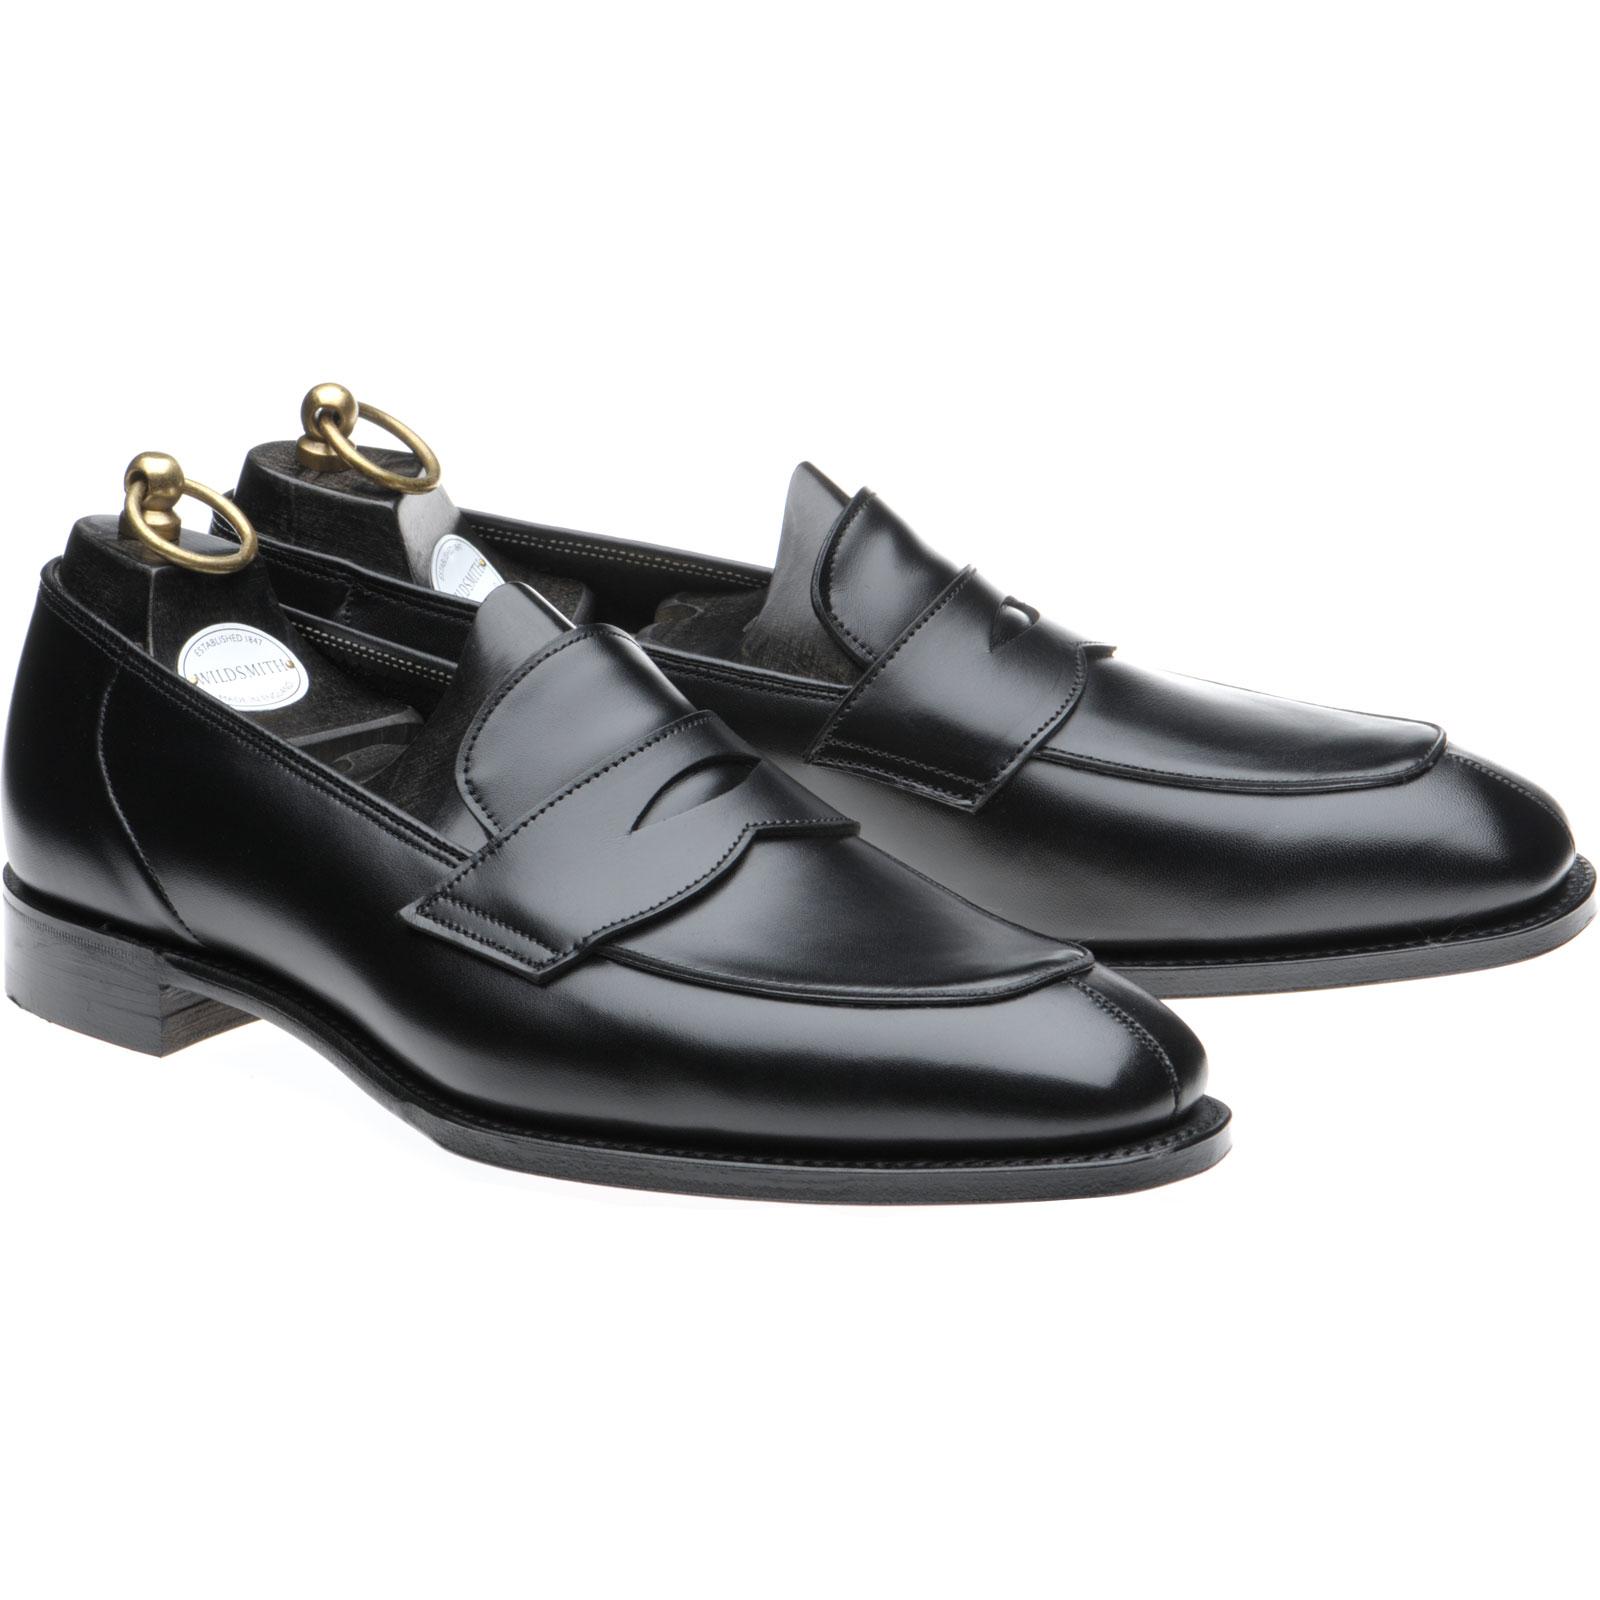 Wildsmith Windsor loafers